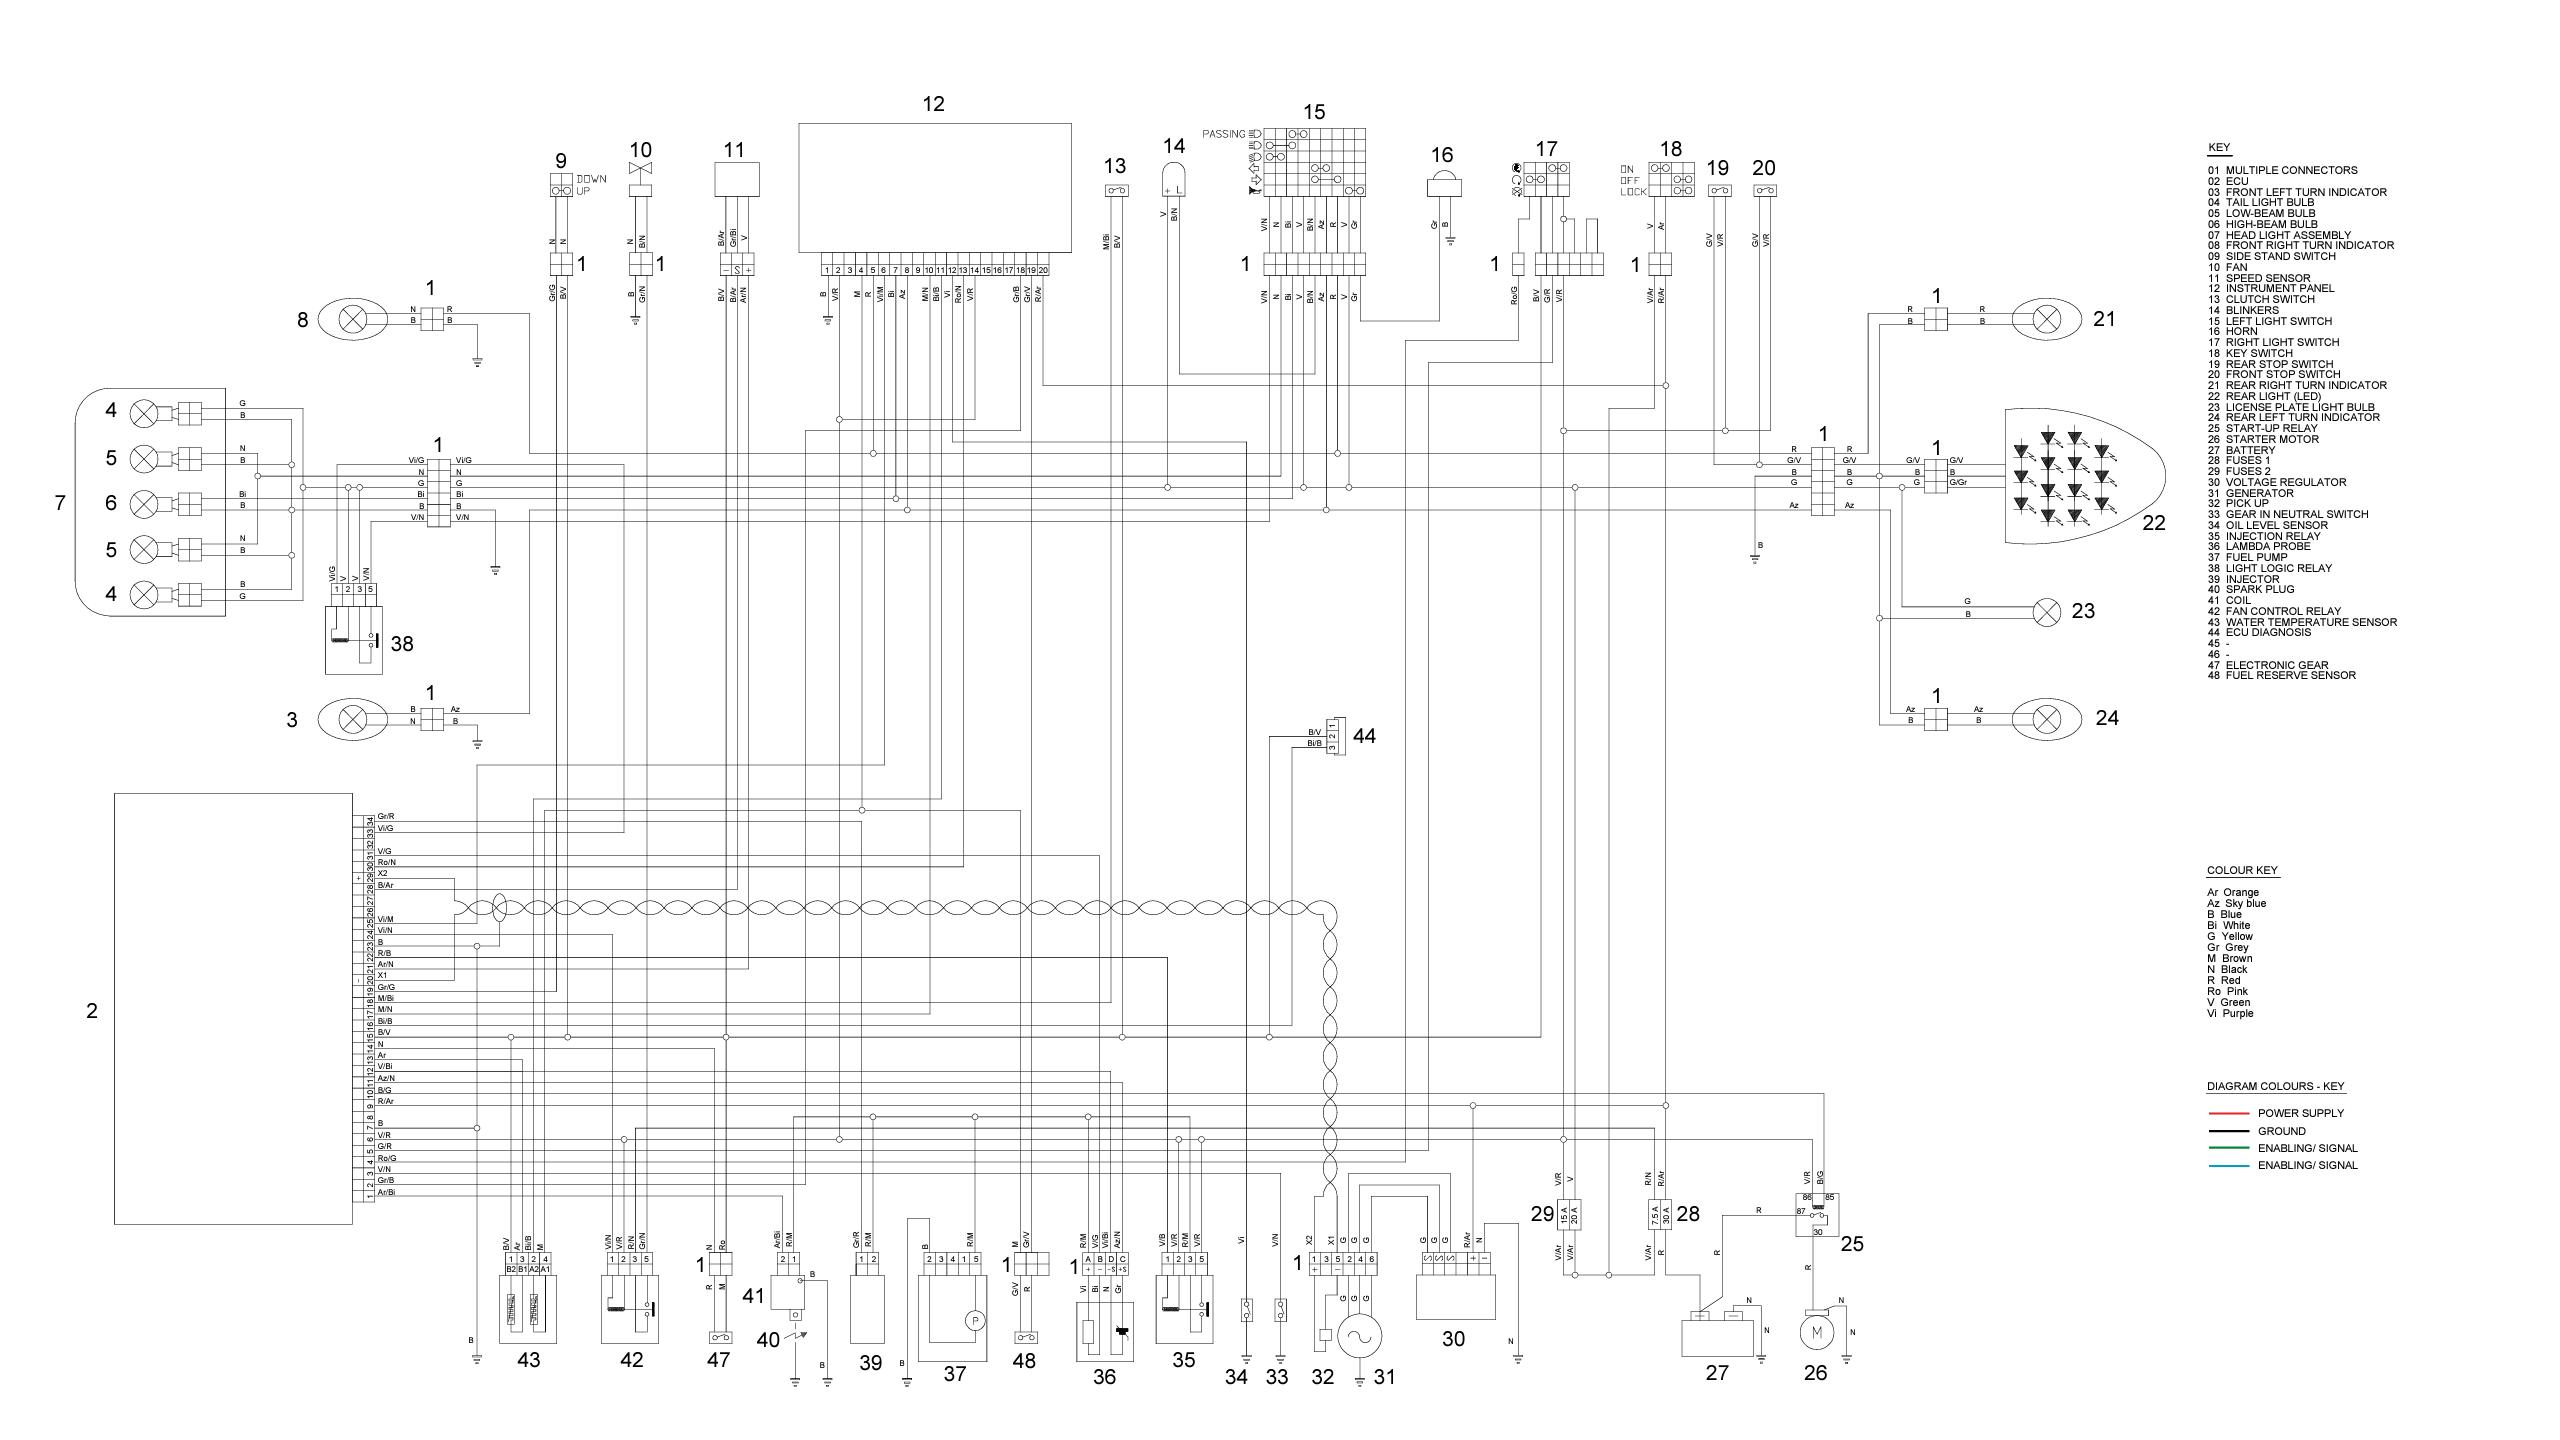 Erfreut Aprilia Rs 125 Schaltplan Fotos - Schaltplan Serie Circuit ...